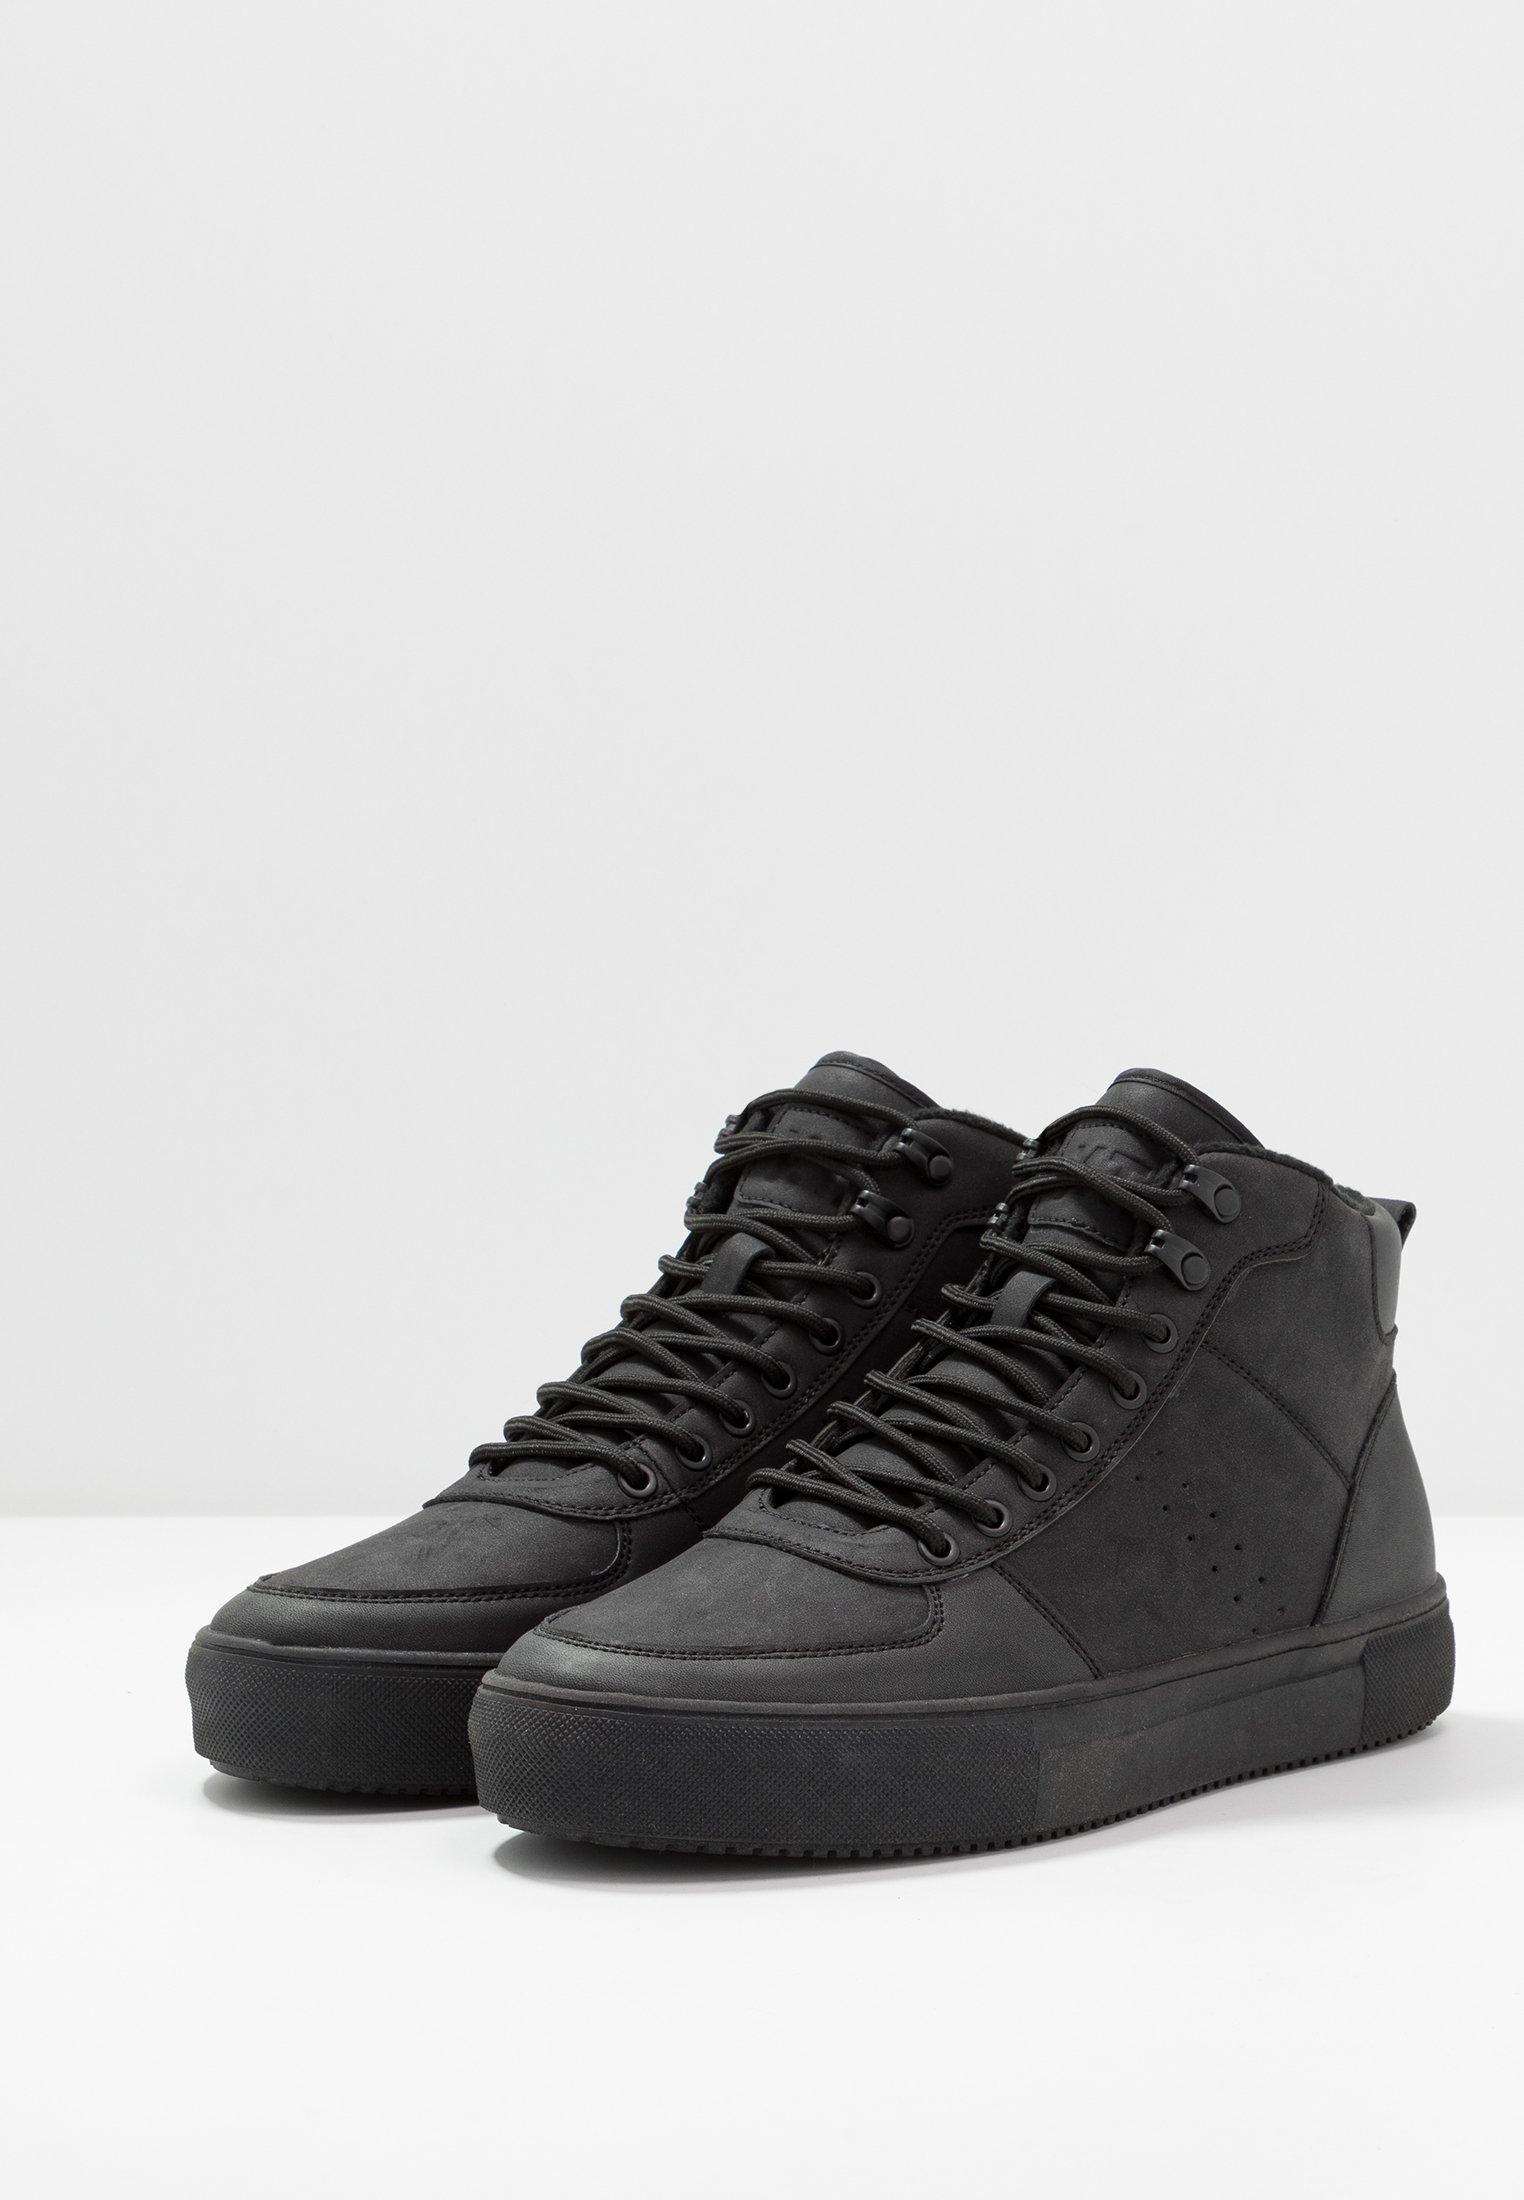 Yourturn Alte Black Sneakers Alte Black Yourturn Alte Black Yourturn Sneakers Sneakers OiuPkXZ